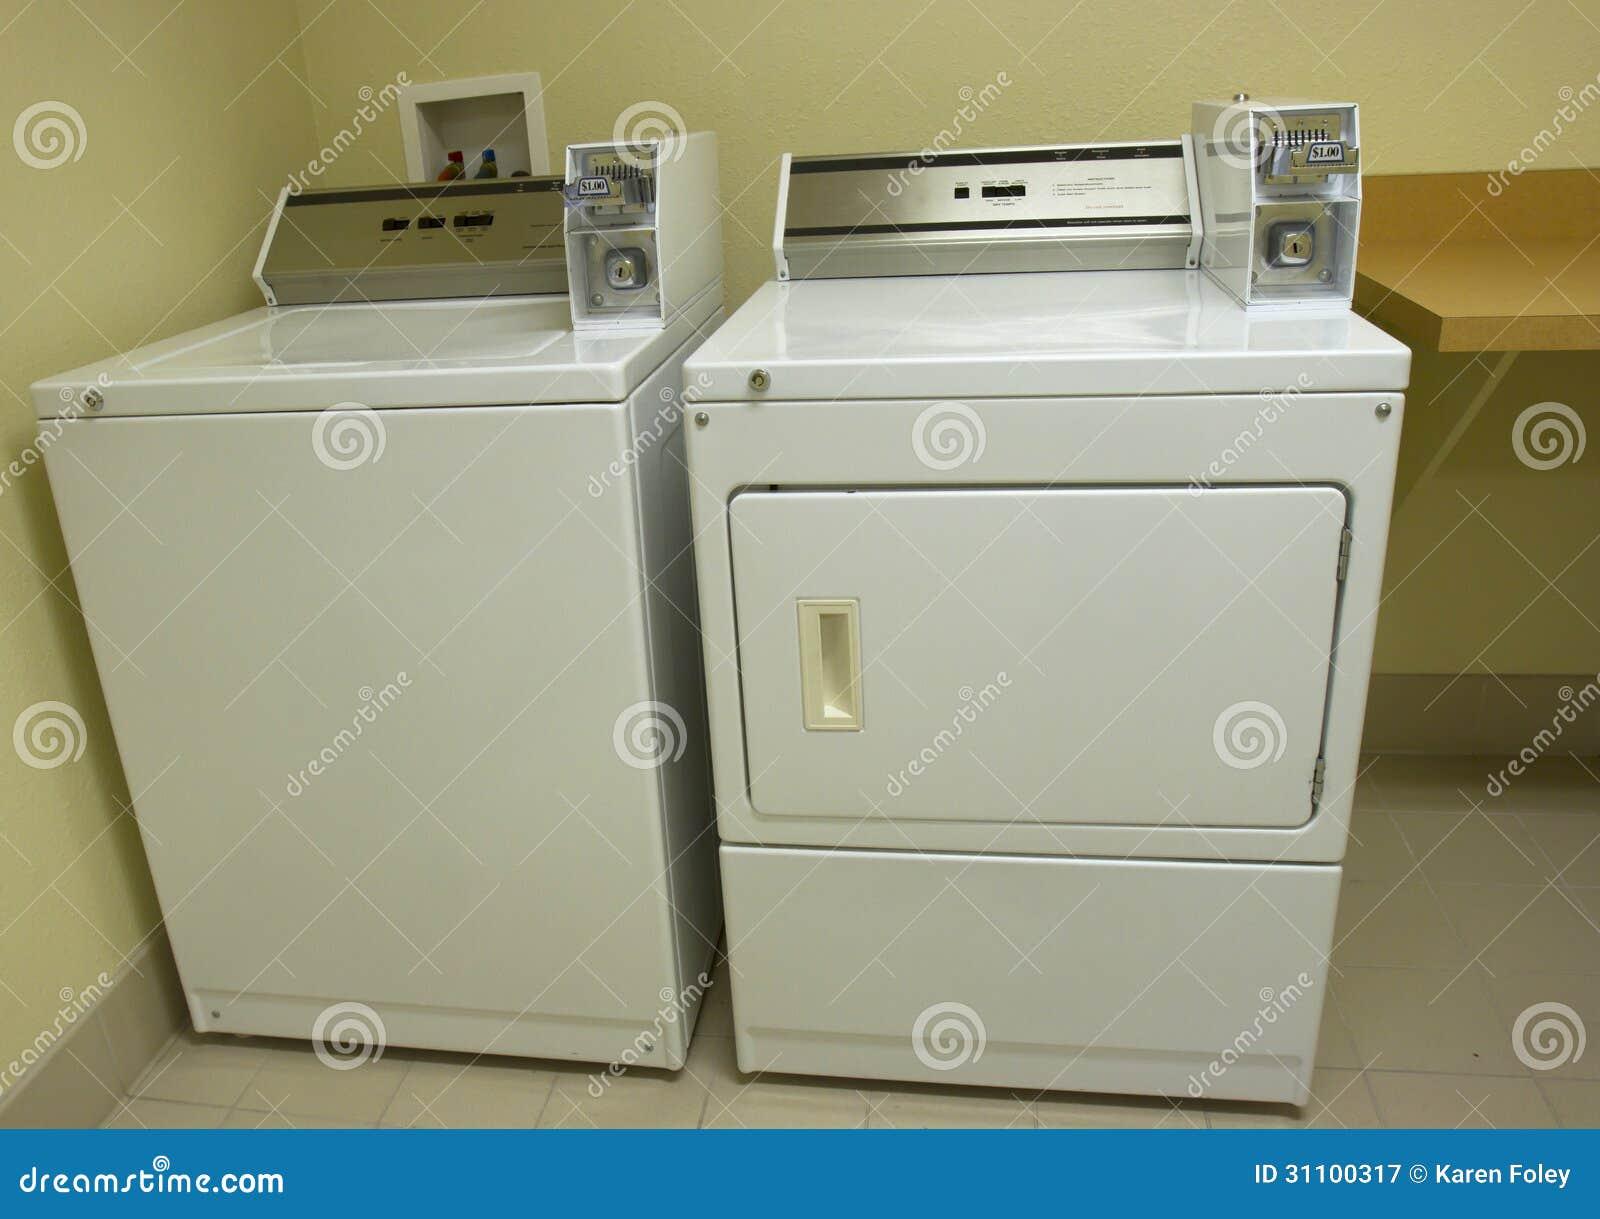 laundry mat washing machine